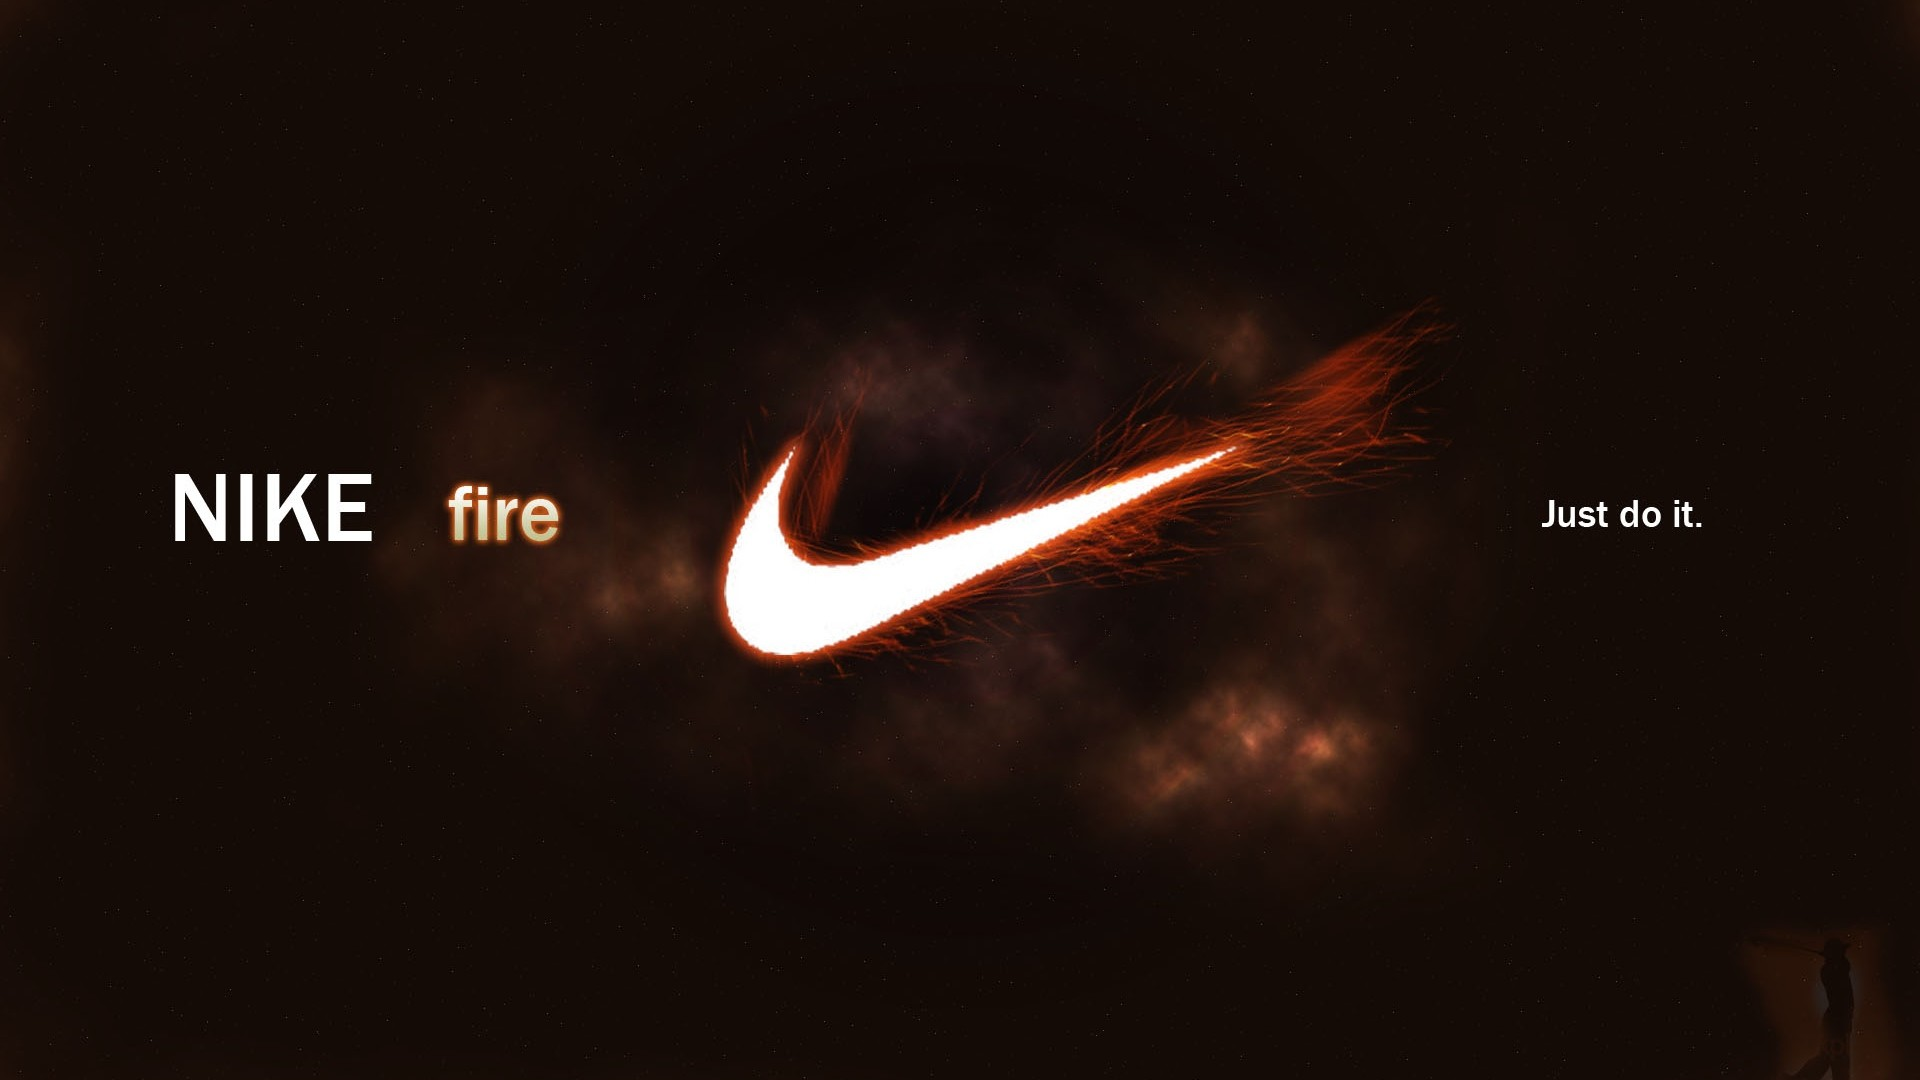 Wallpaper Nike fire, Logo, Sports brand Full HD 1080p HD .